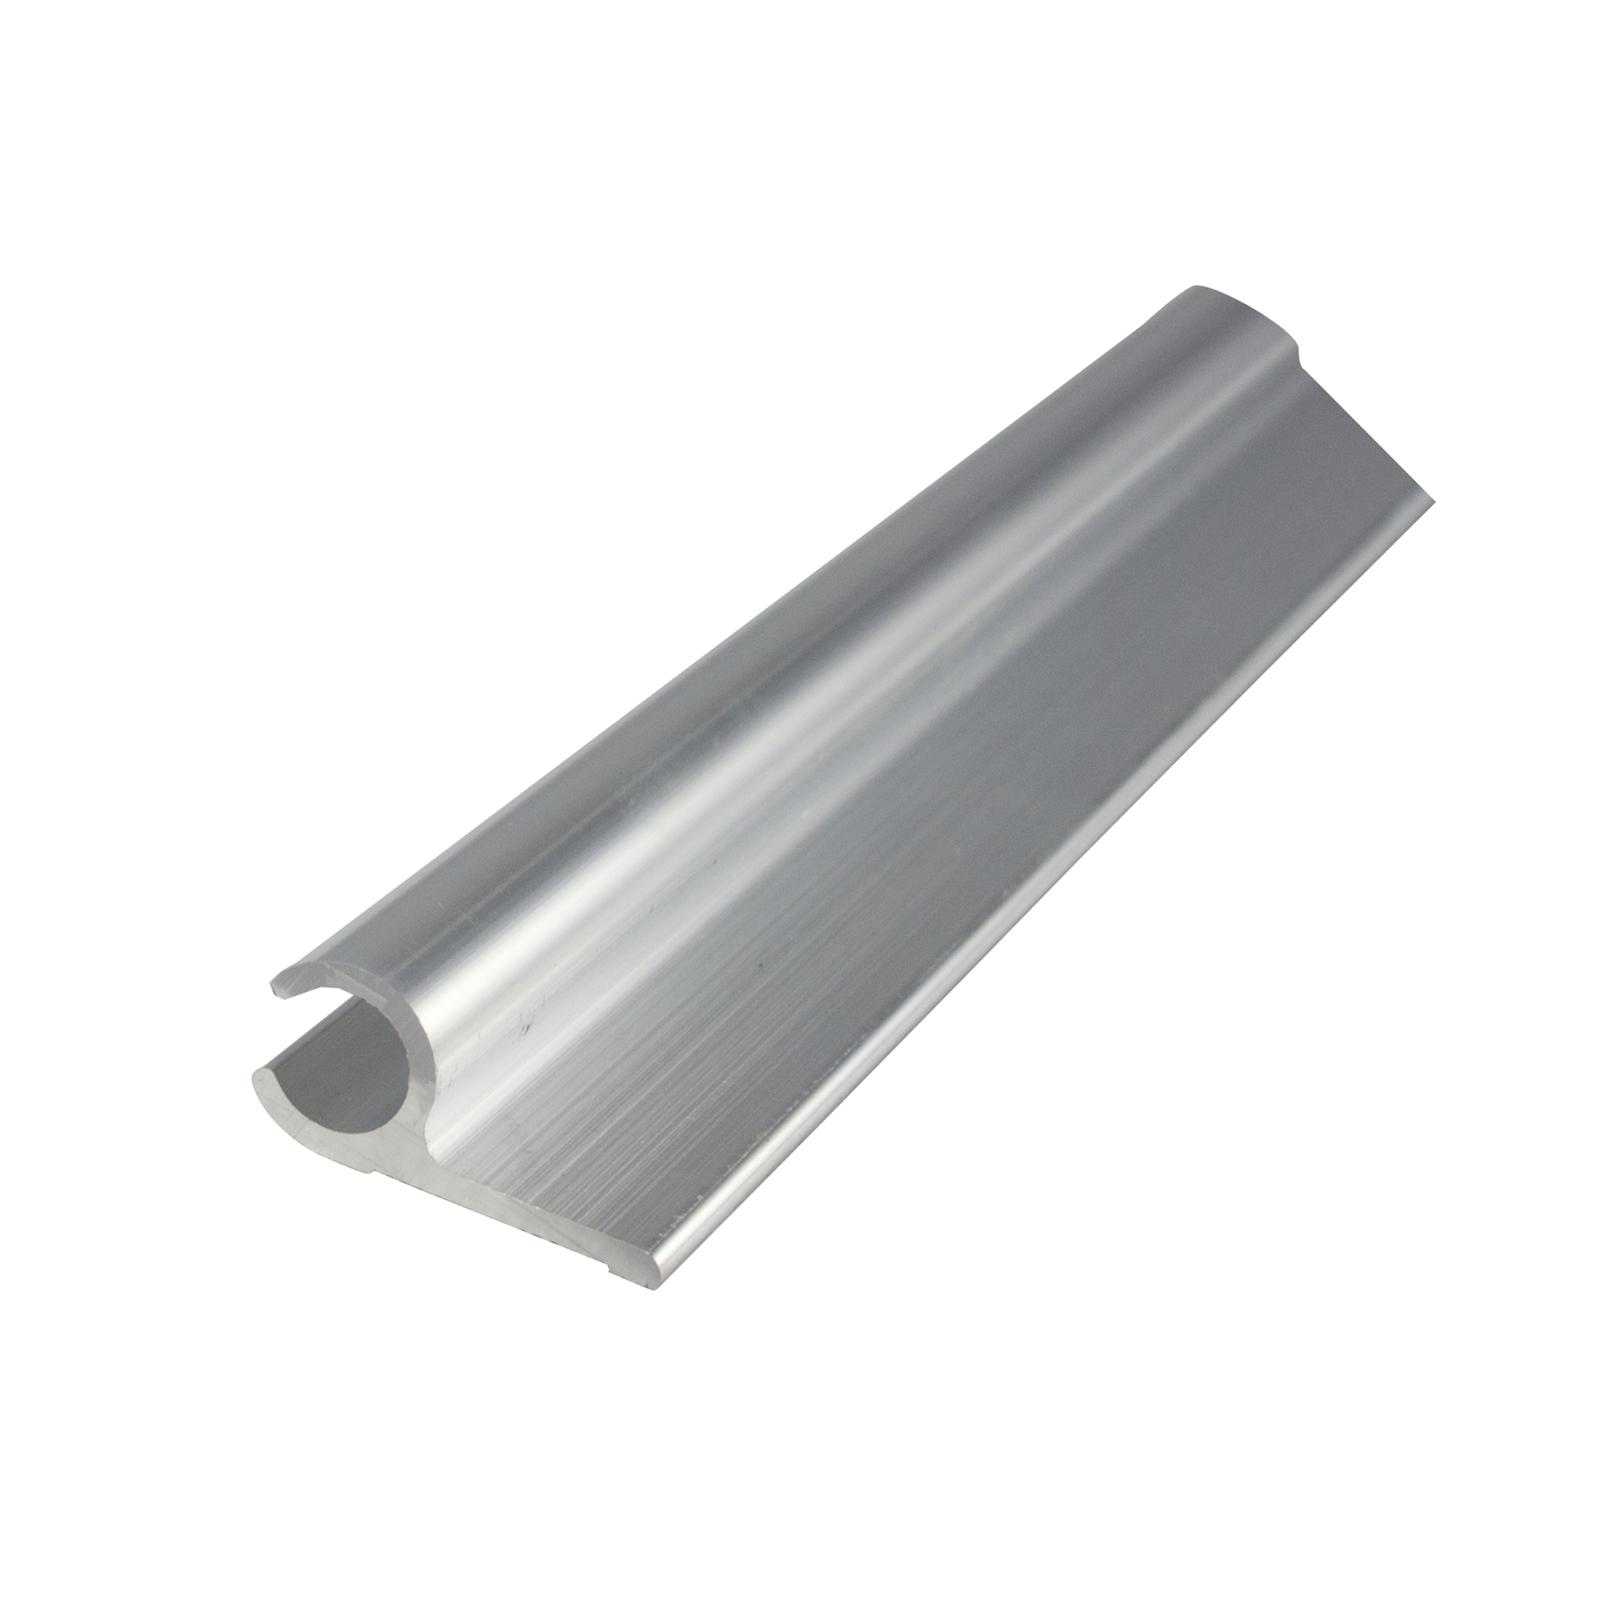 Metal Mate 27.95 x 12.7 x 1.7mm 3m Aluminium Section Sail Track